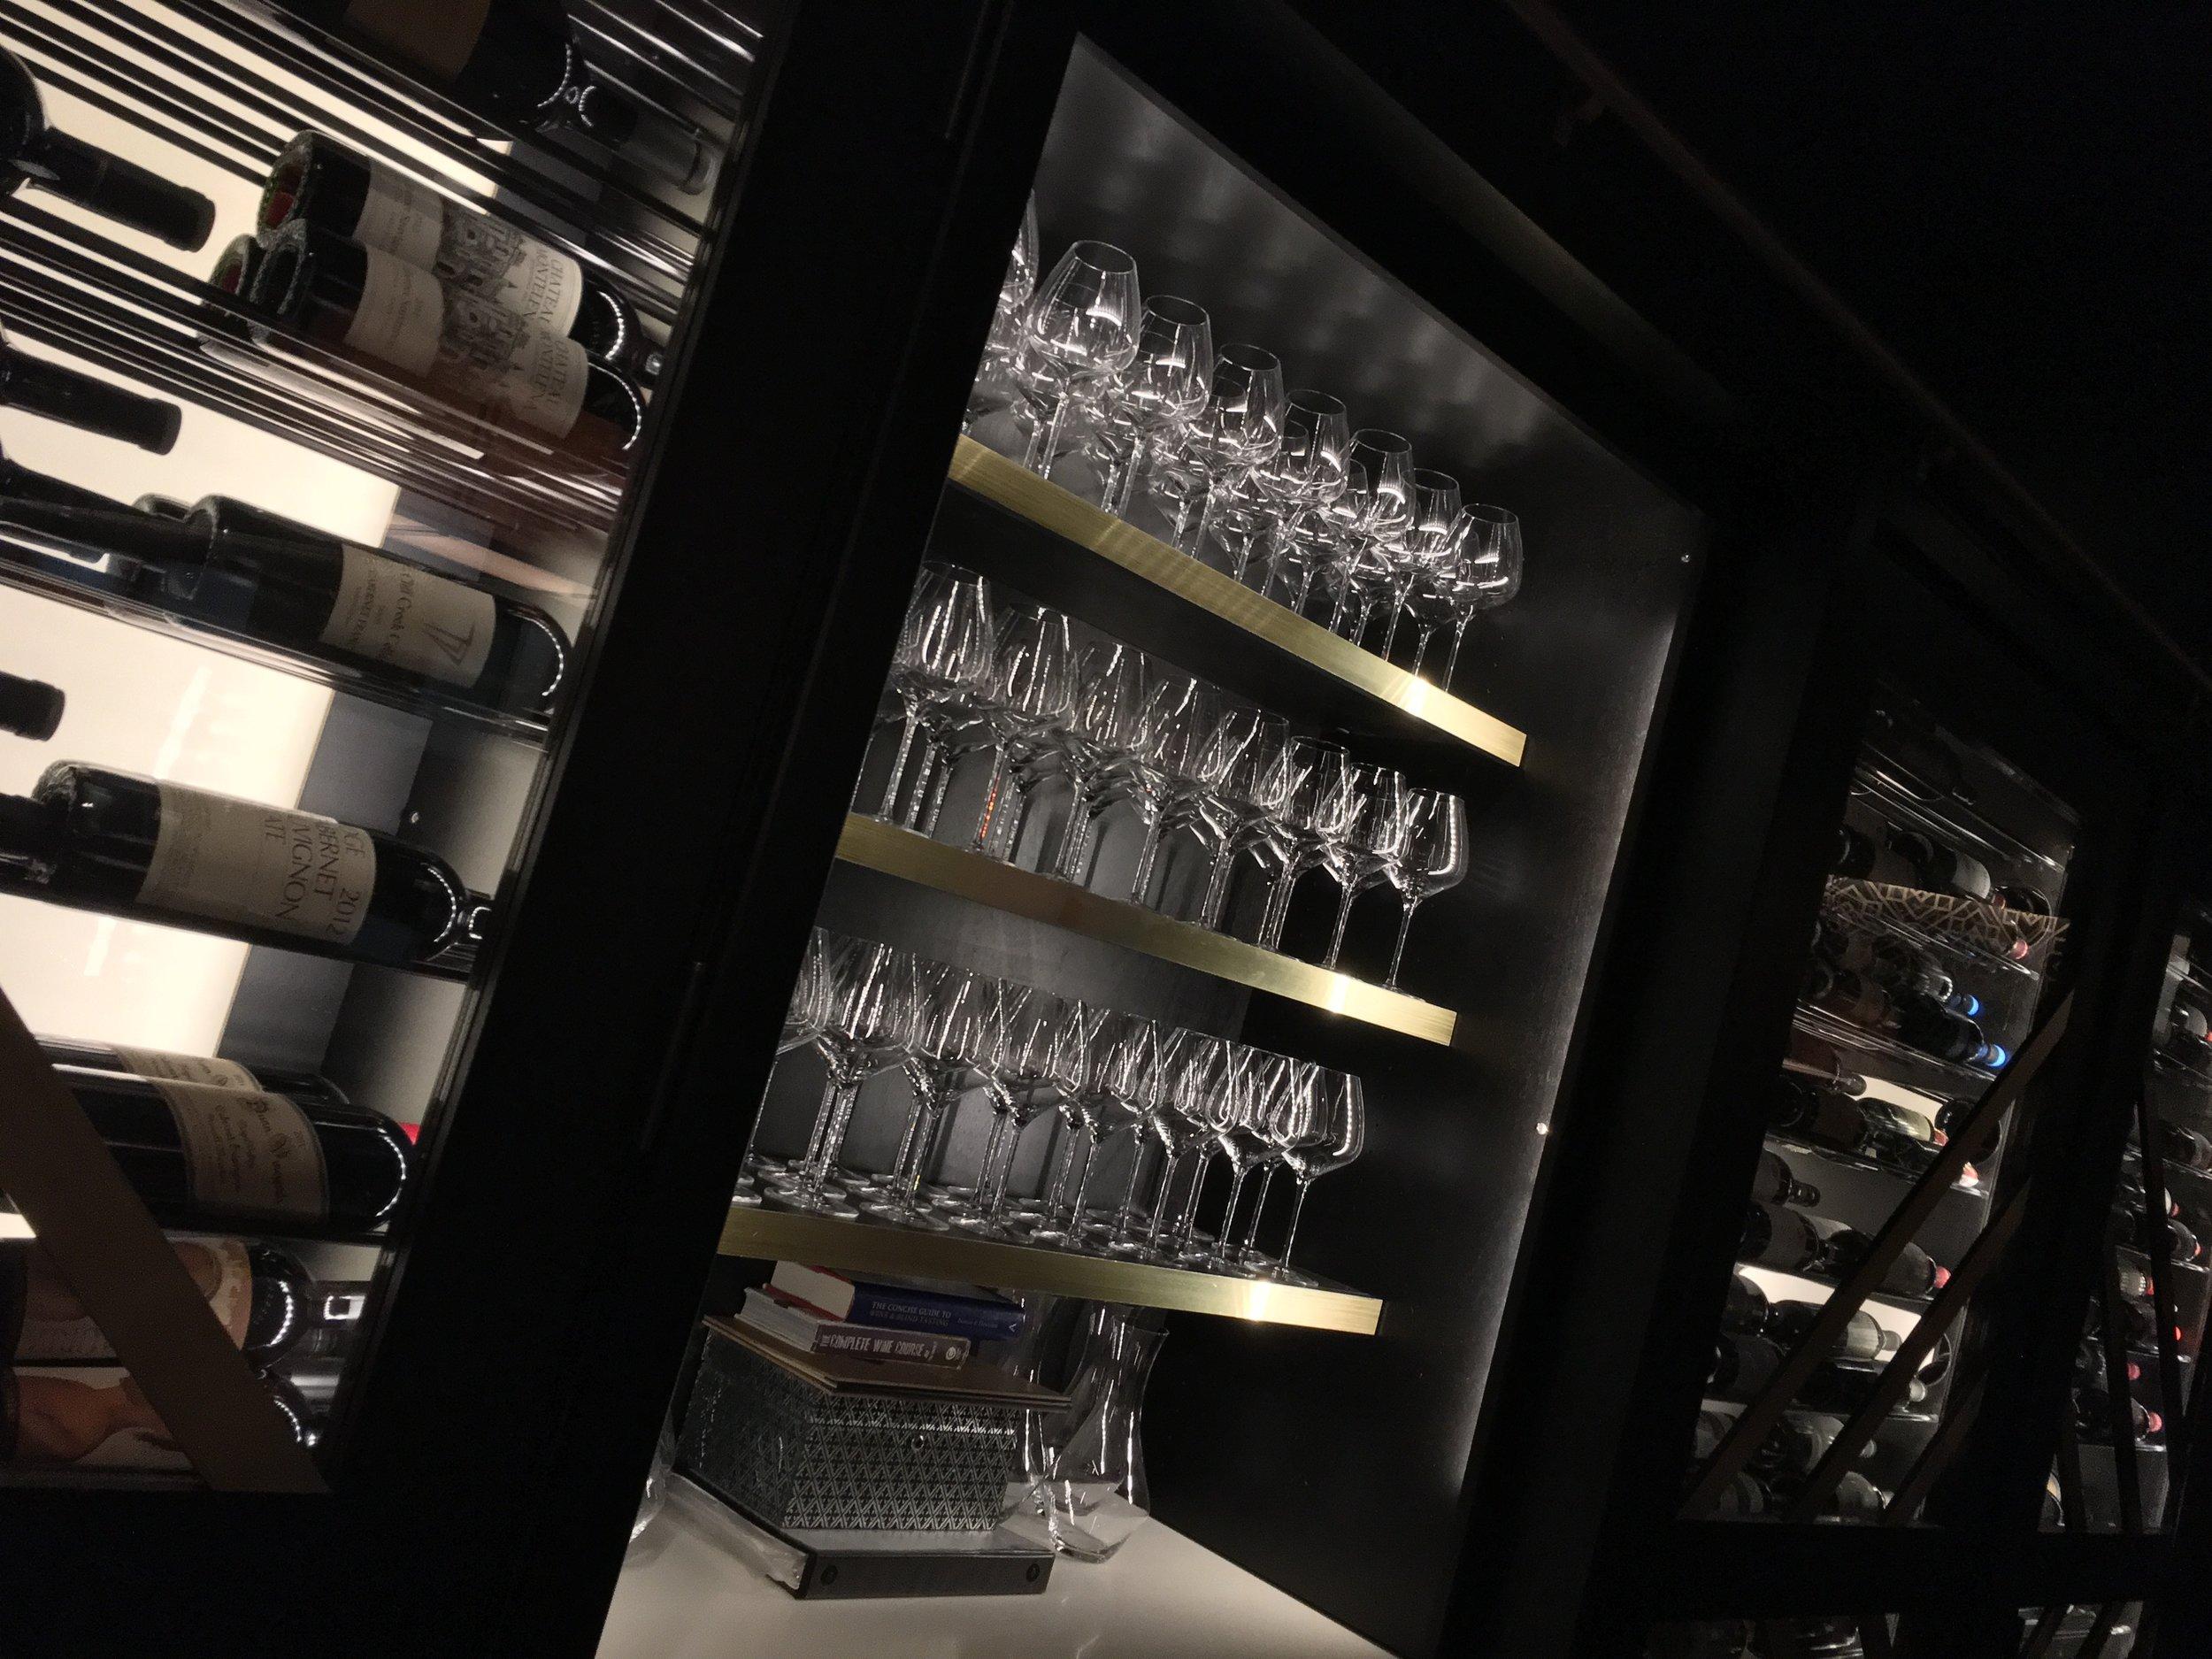 union-common-wine-cellar